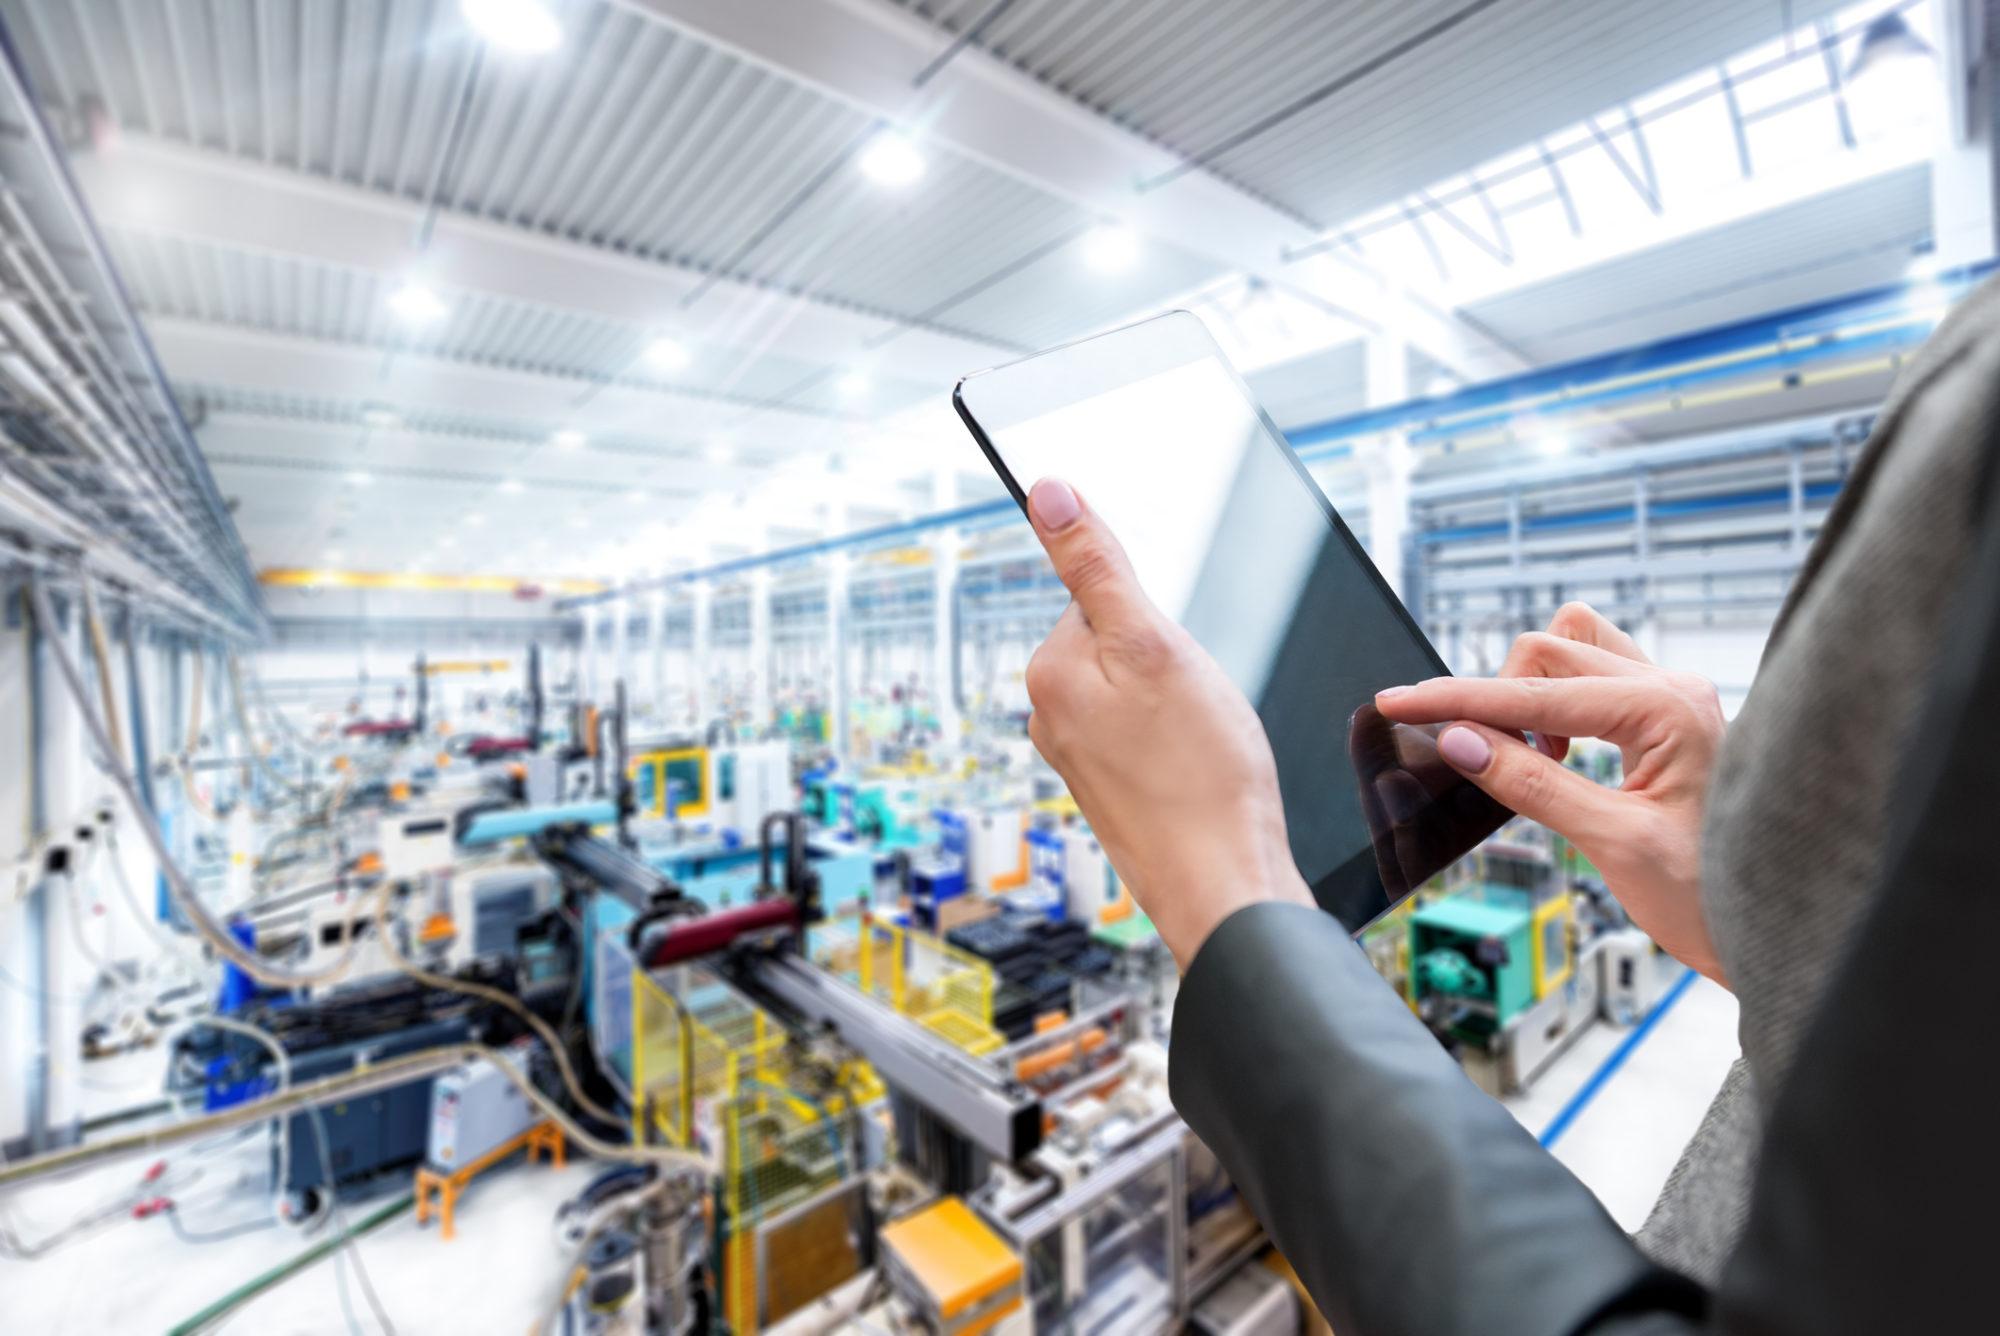 Expertise & digital tablet & production line